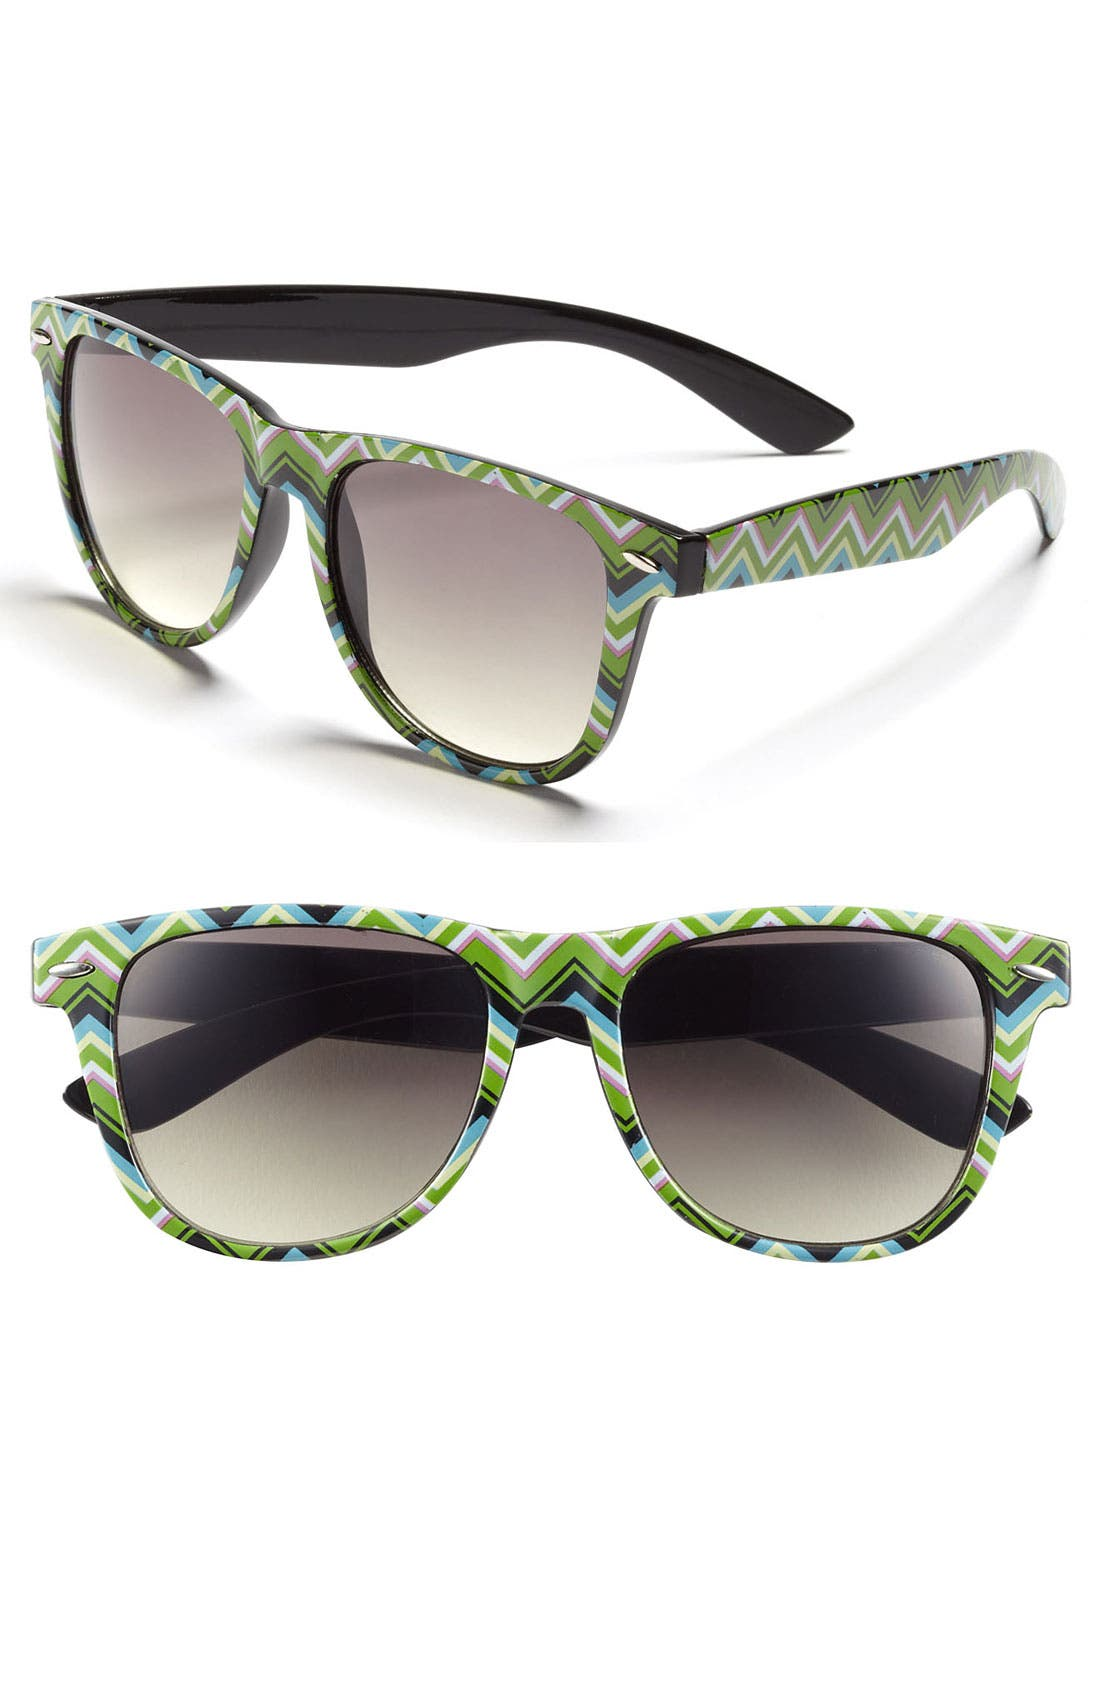 Main Image - A.J. Morgan Retro Sunglasses